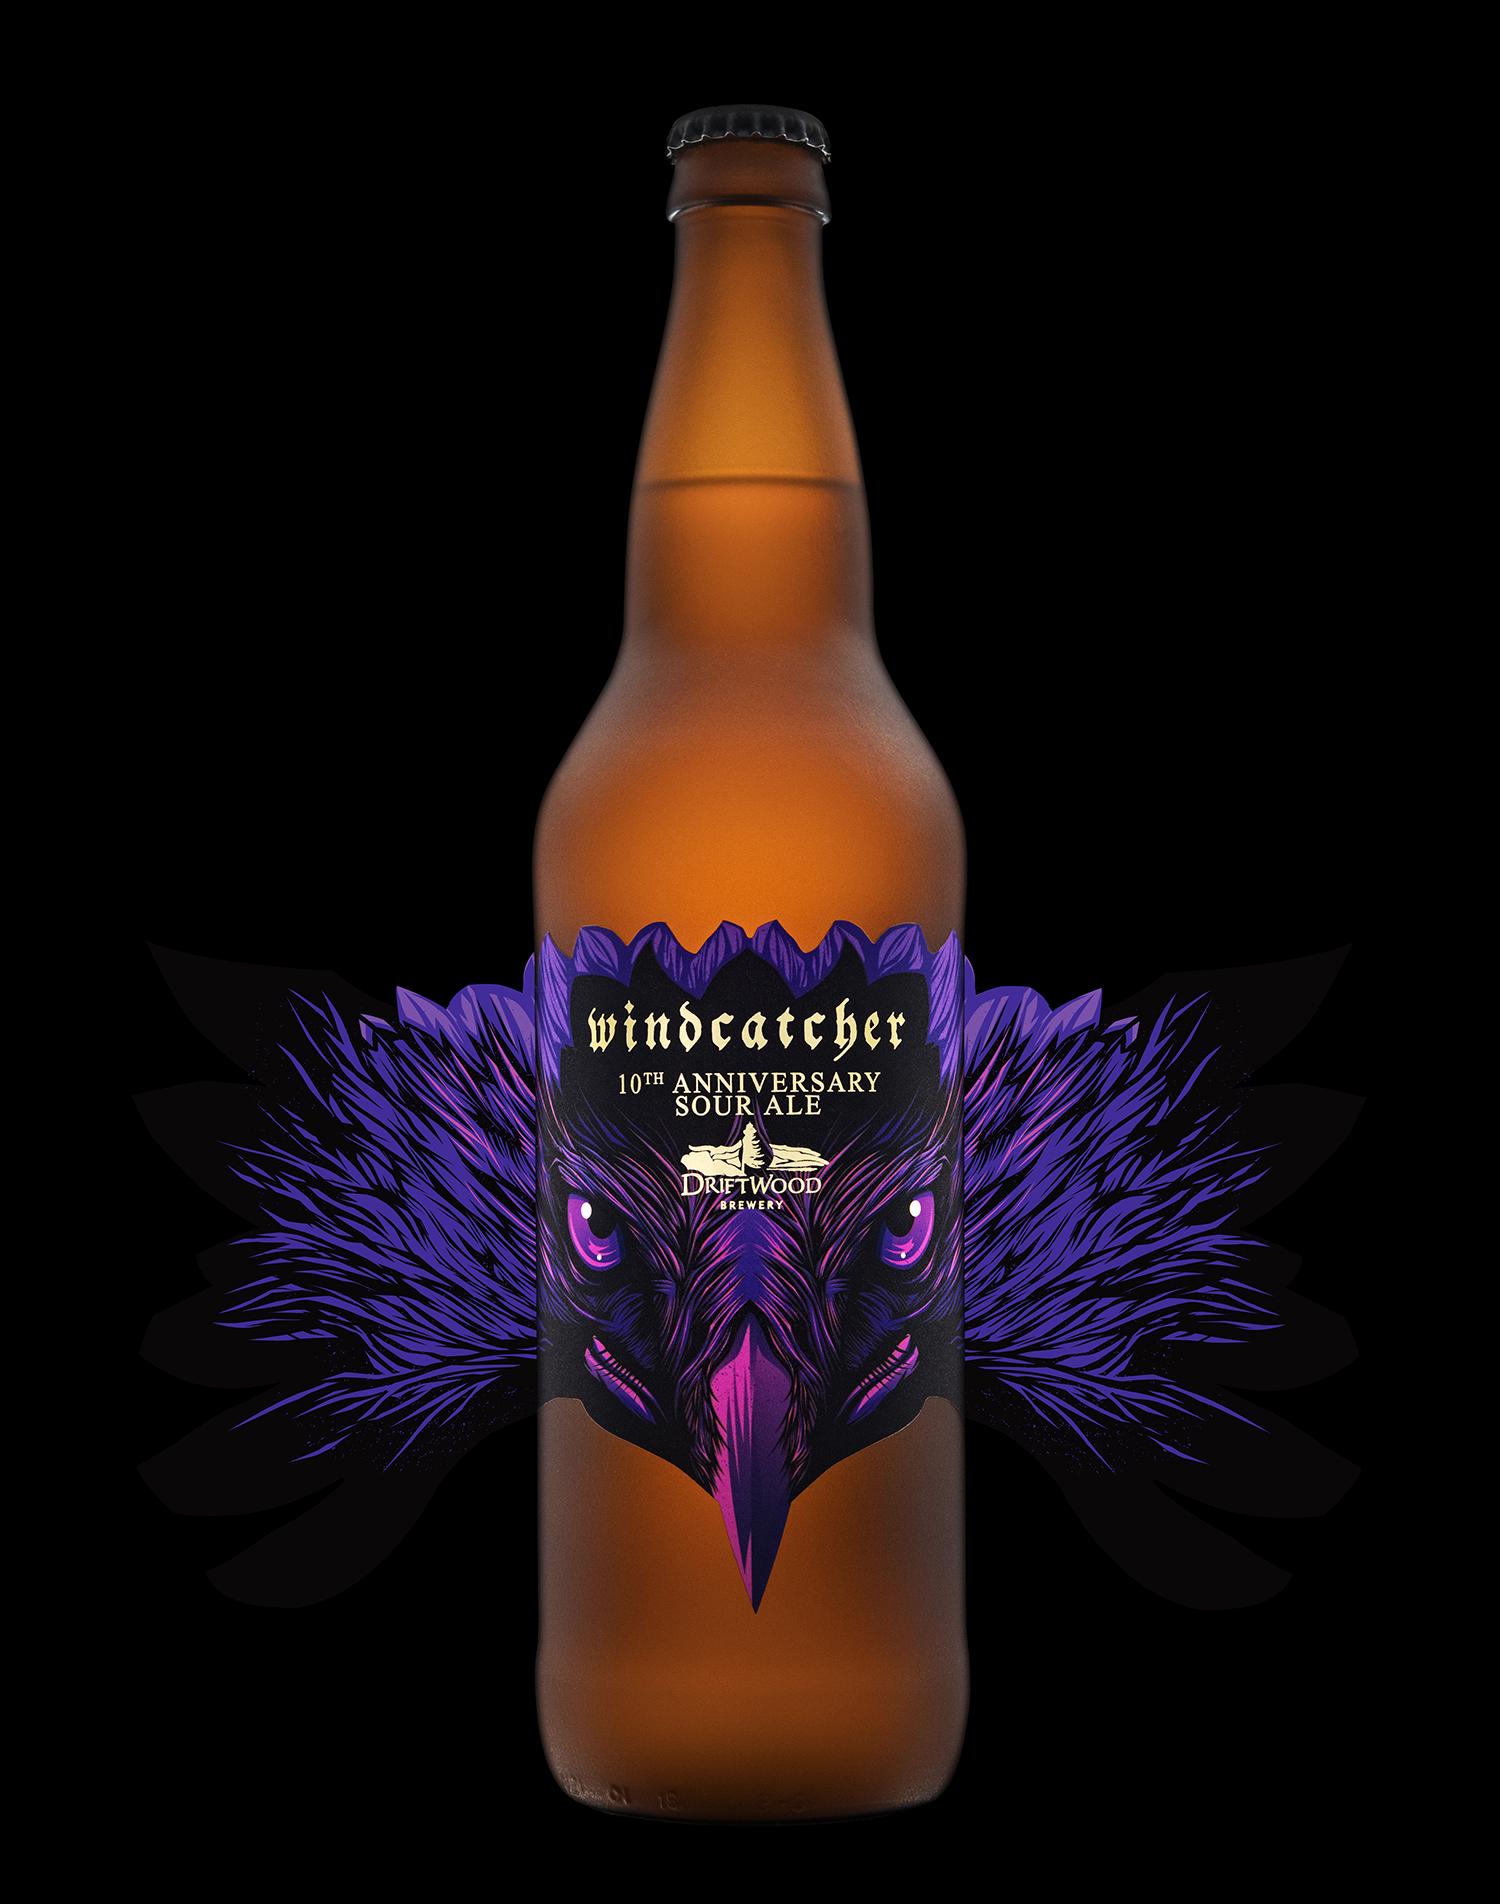 Windcatcher Anniversary Ale